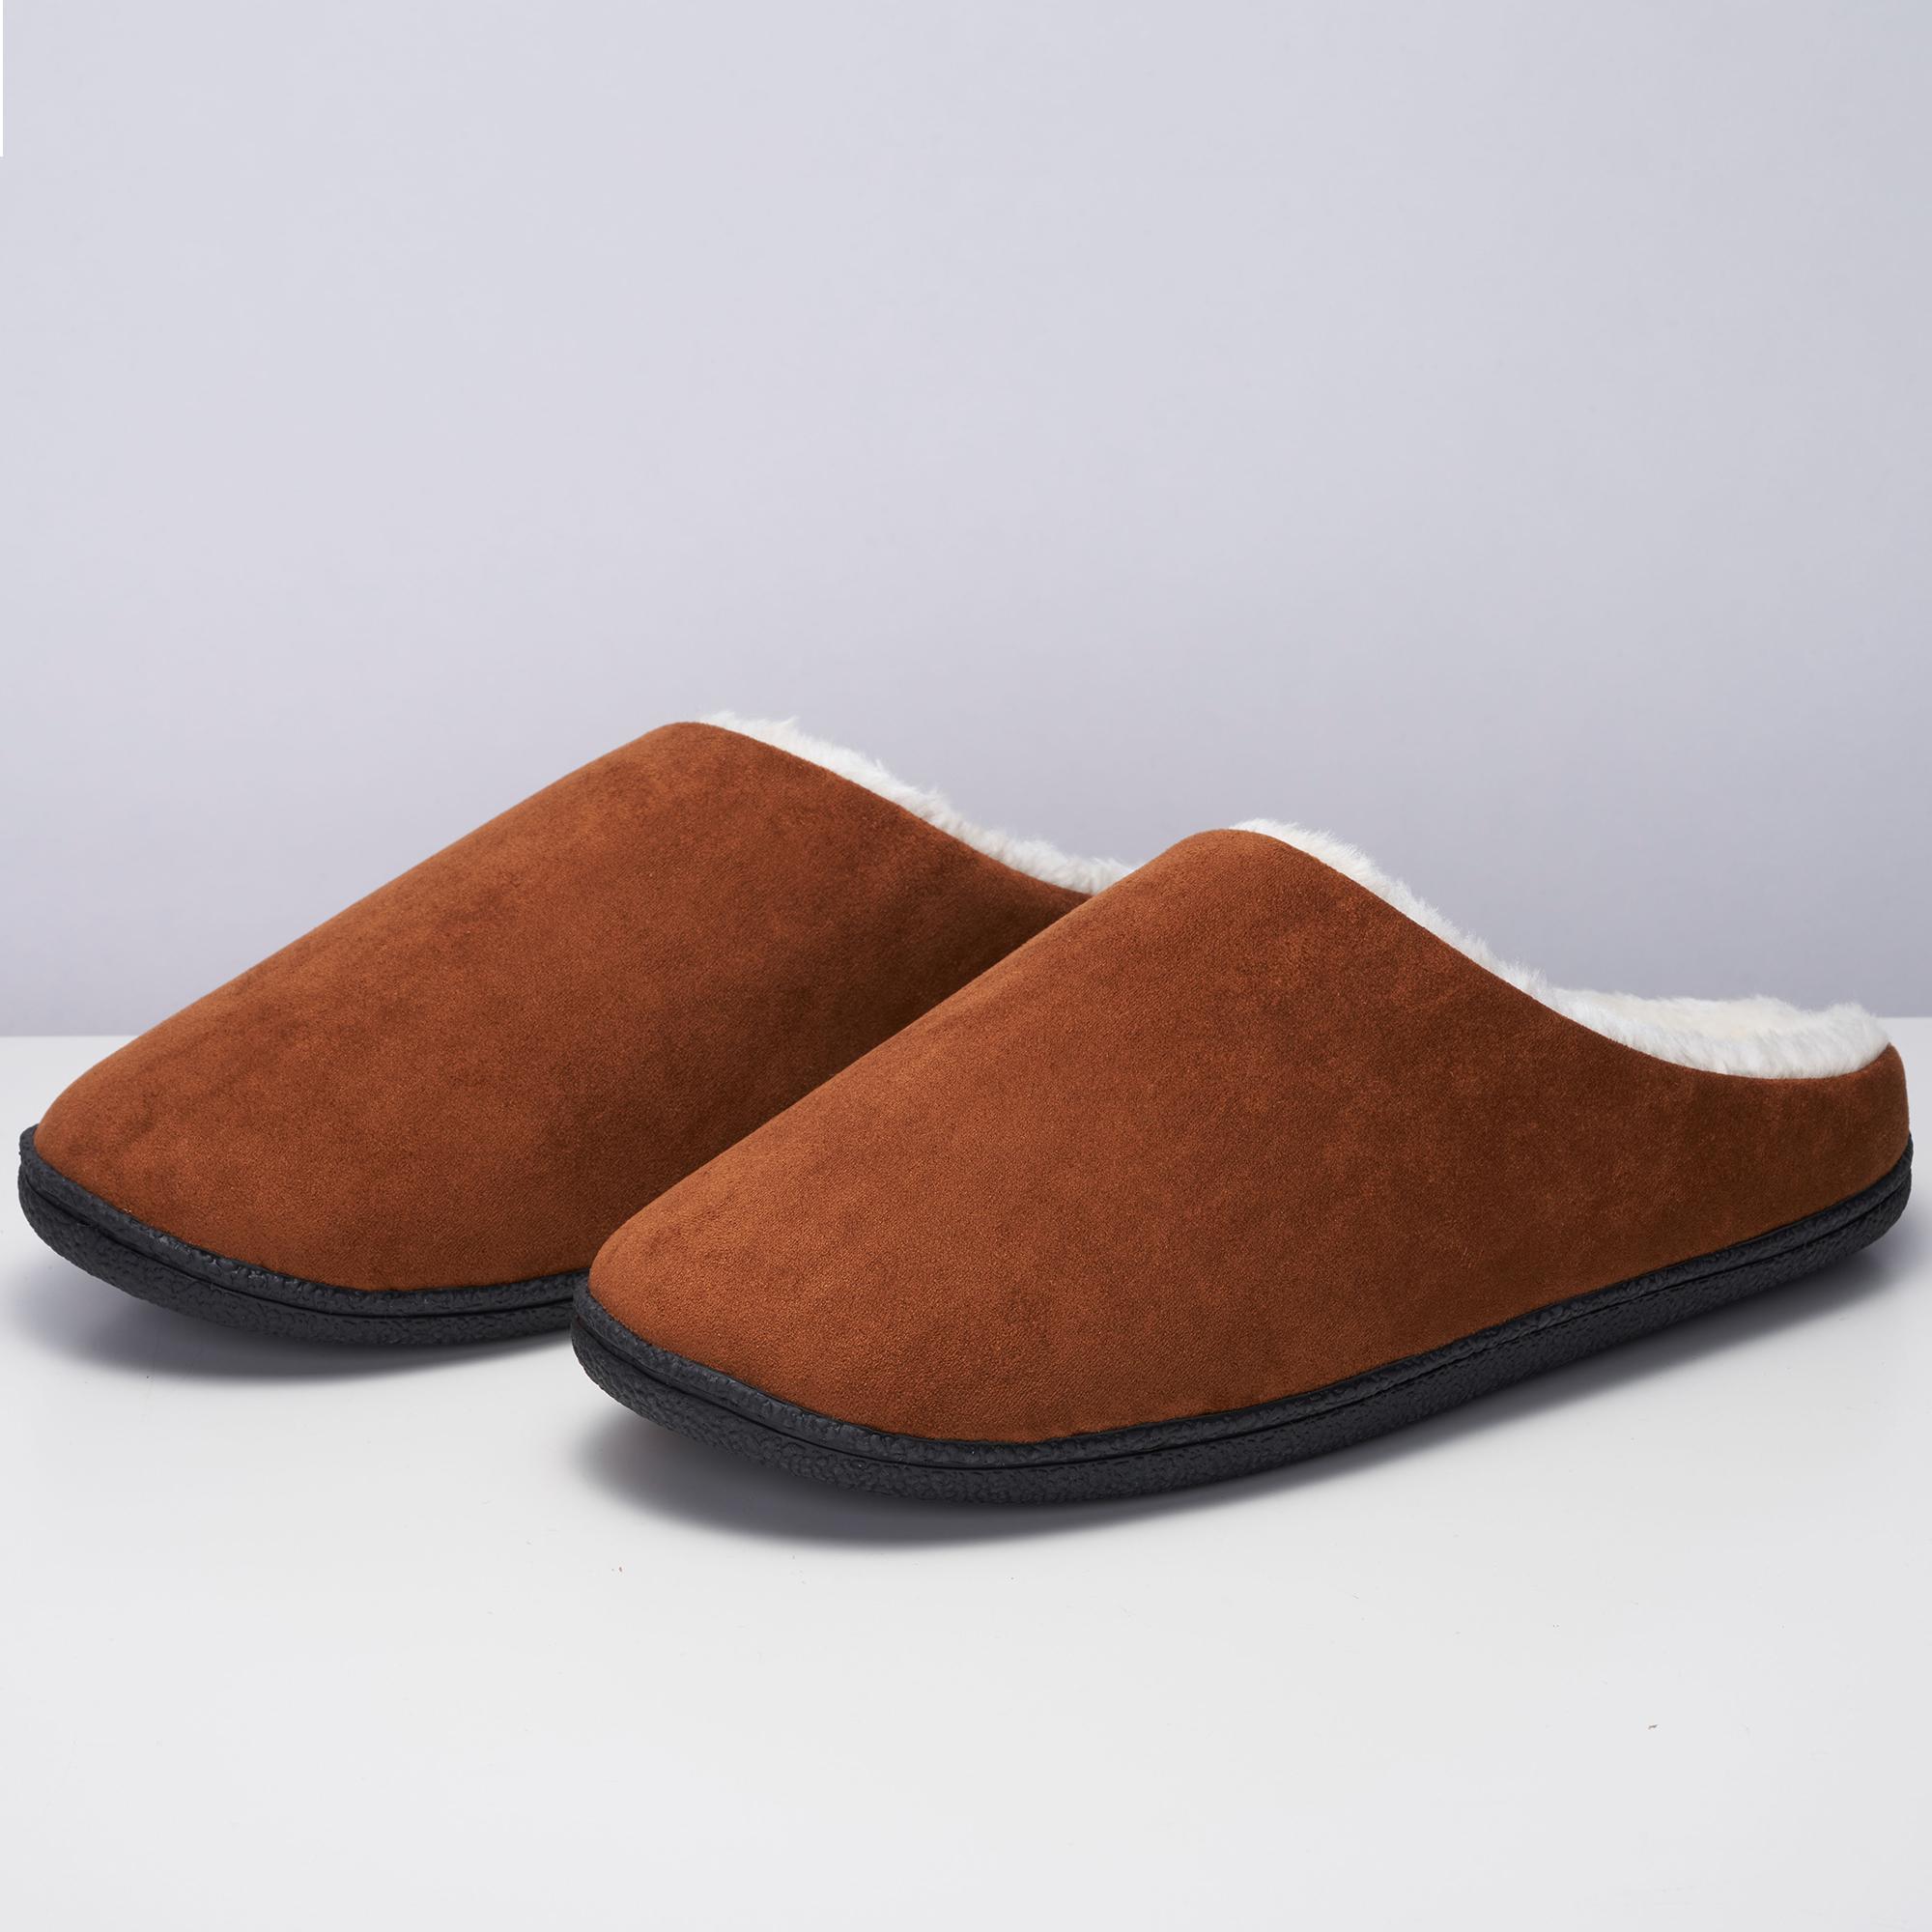 Alpine-Swiss-Mens-Memory-Foam-Clog-Slippers-Indoor-Comfort-Slip-On-House-Shoes thumbnail 23